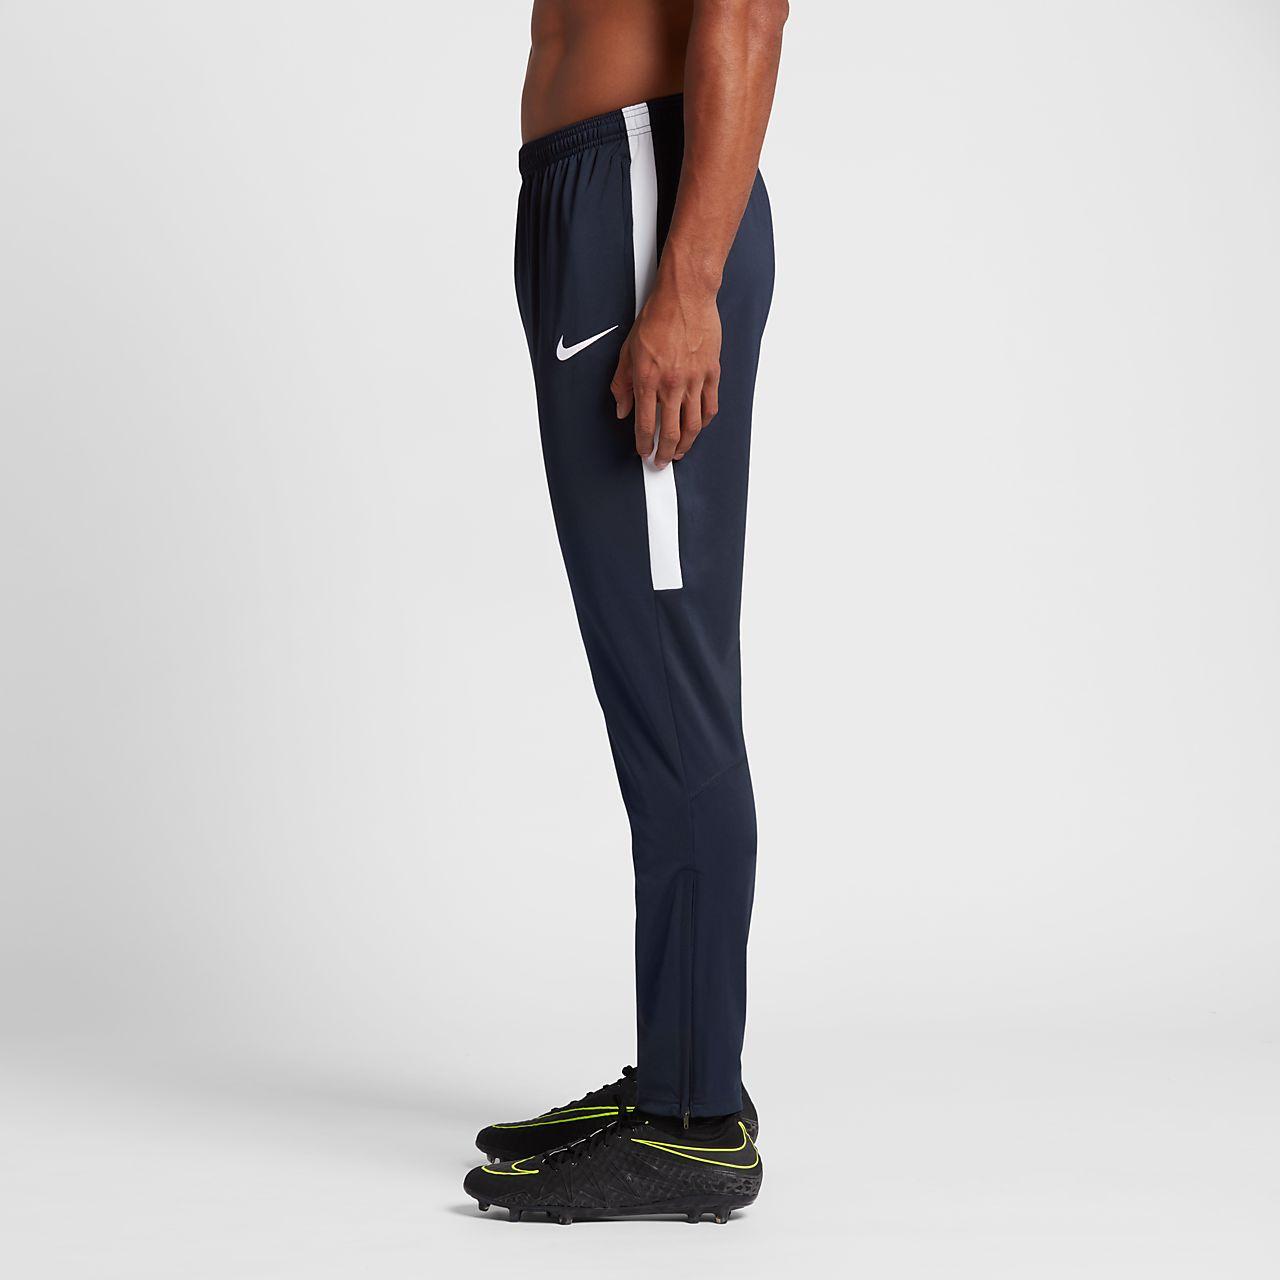 Nike dri fit hose schwarz